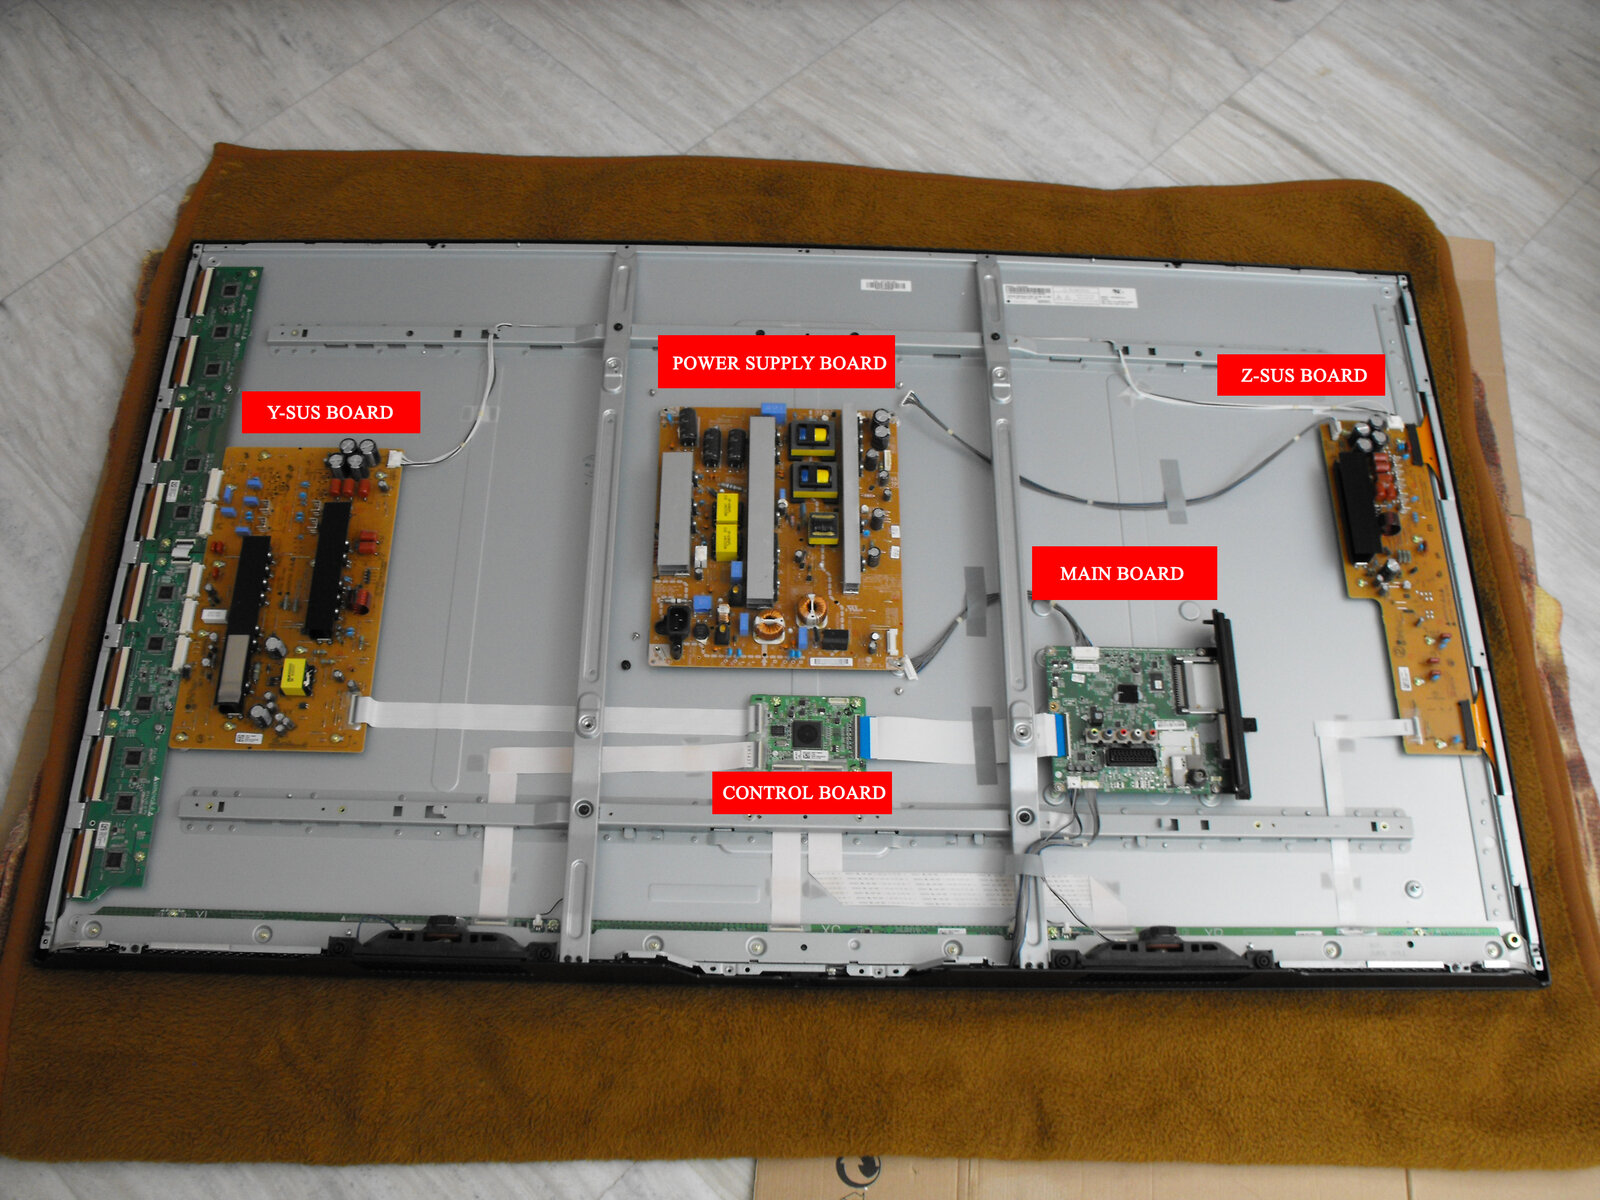 60PB5600 boards.jpg